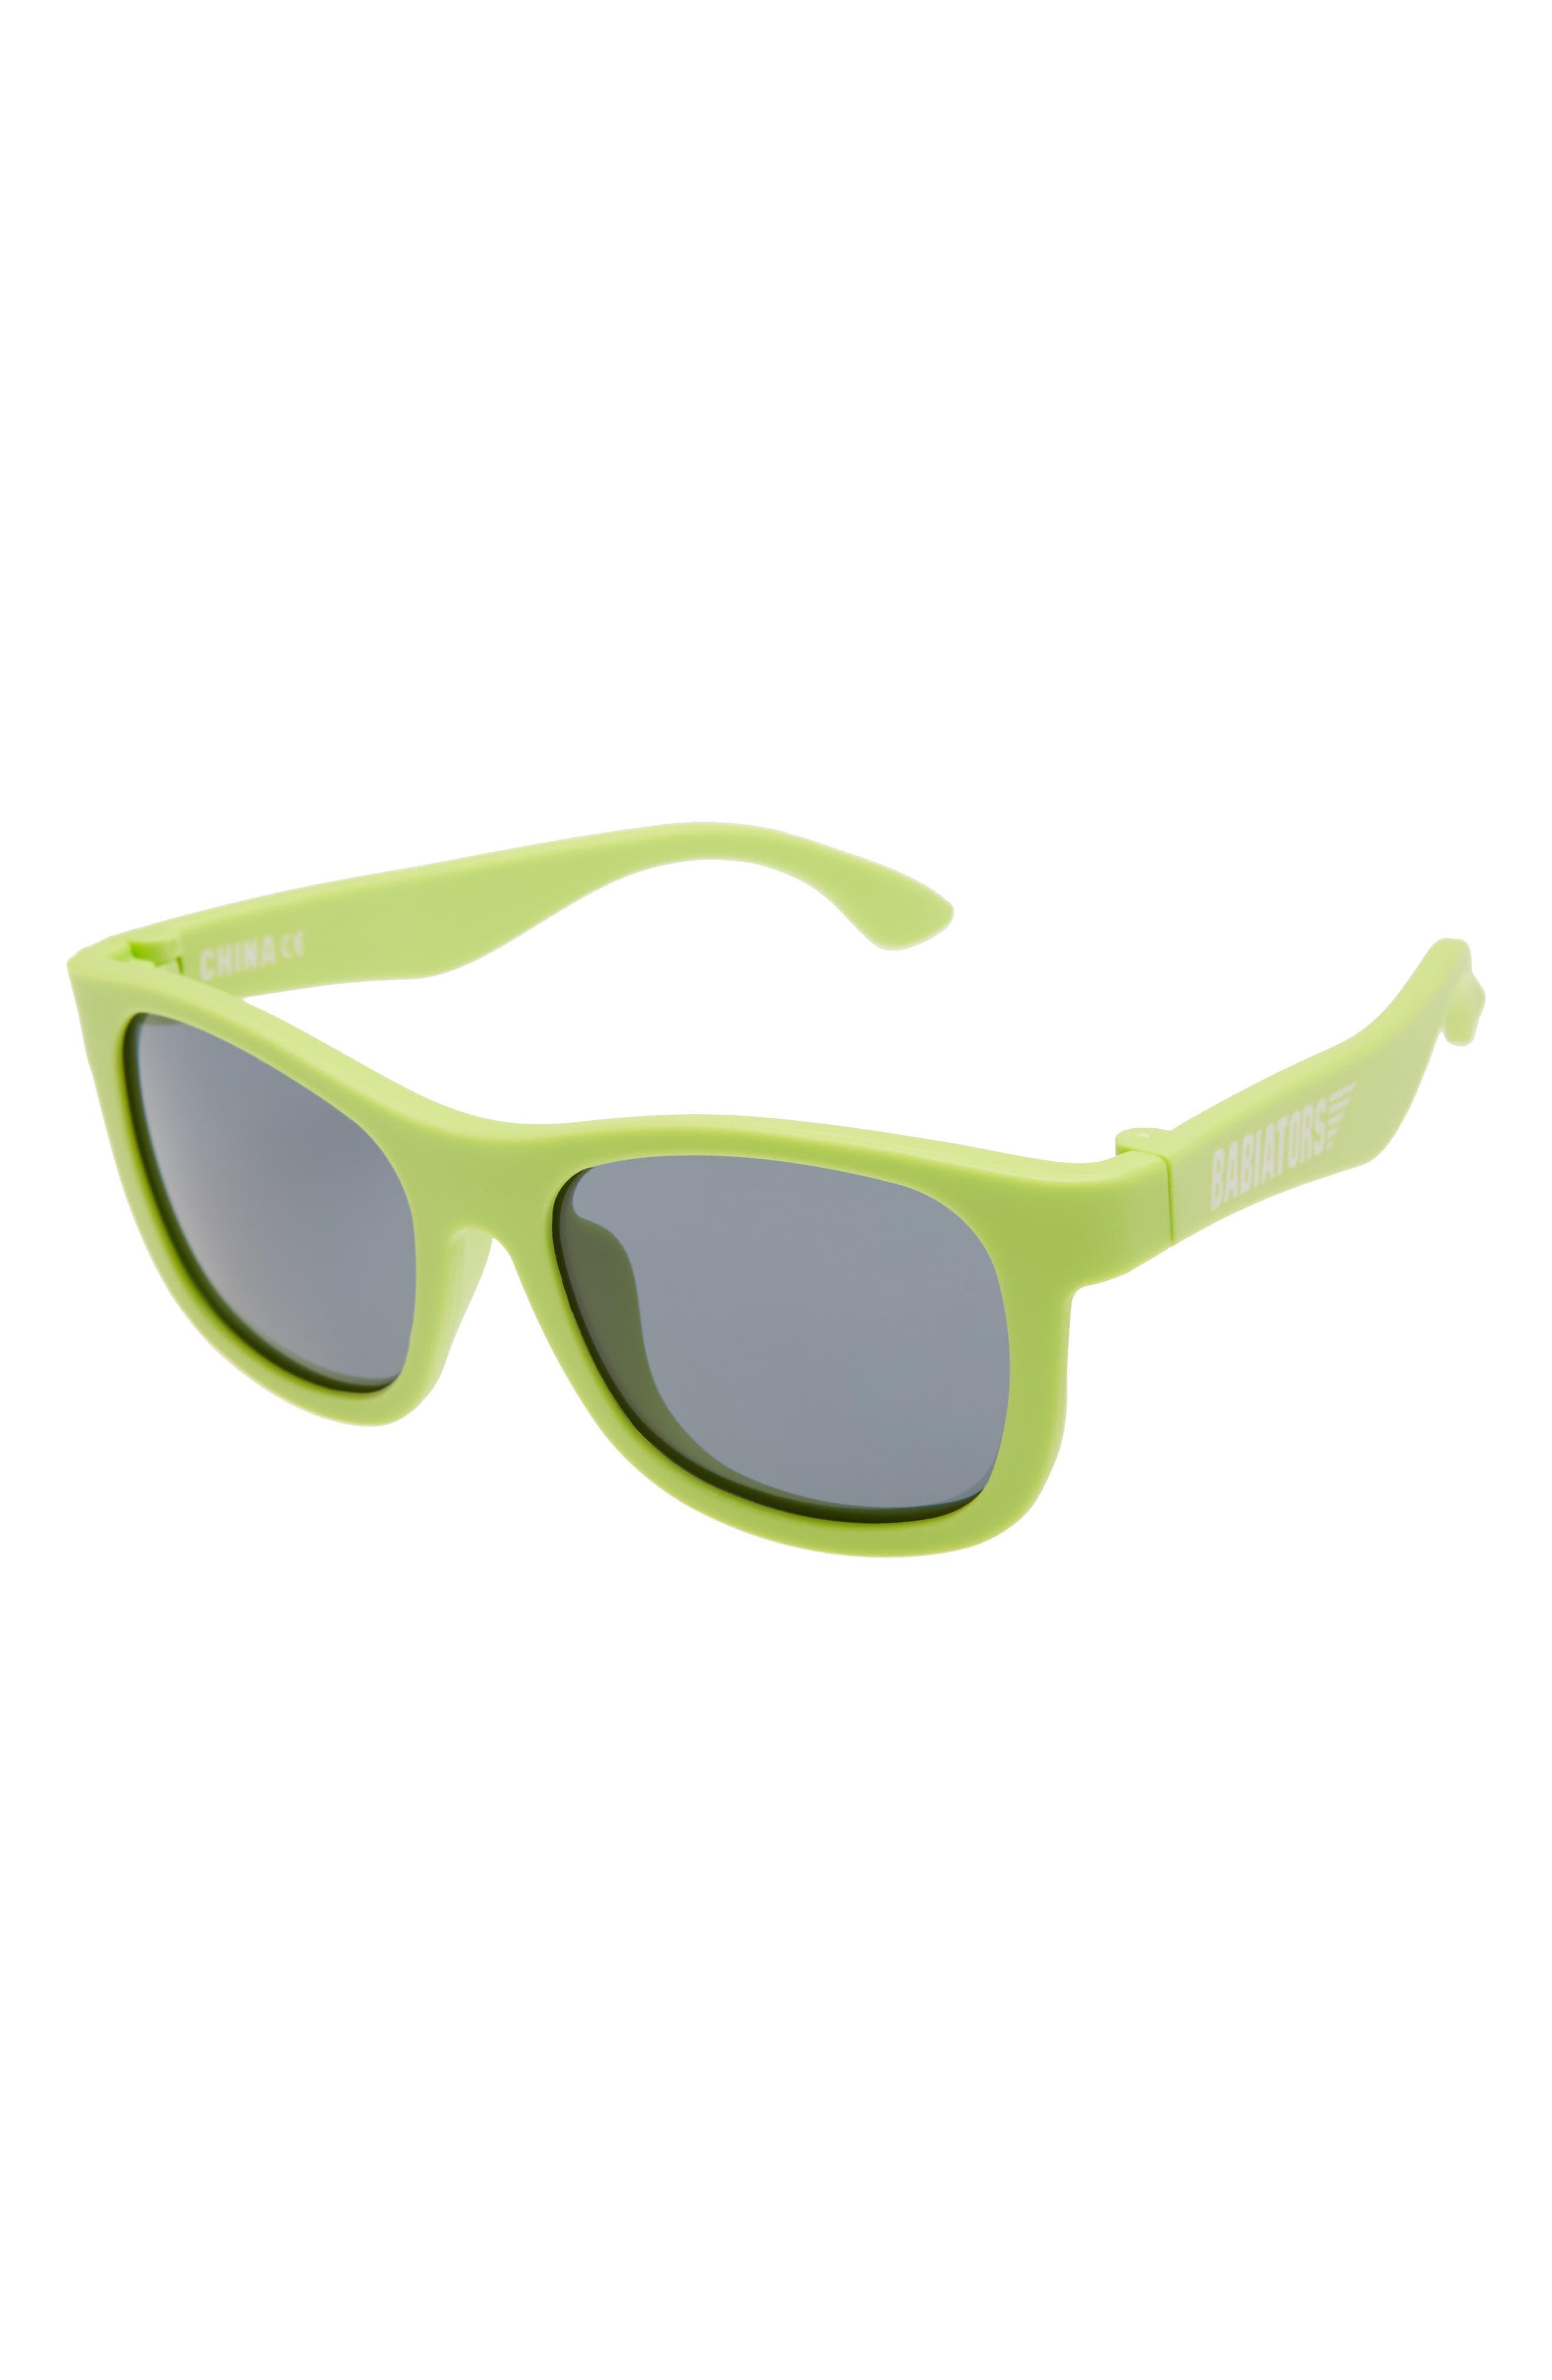 Original Navigators Sunglasses,                         Main,                         color,